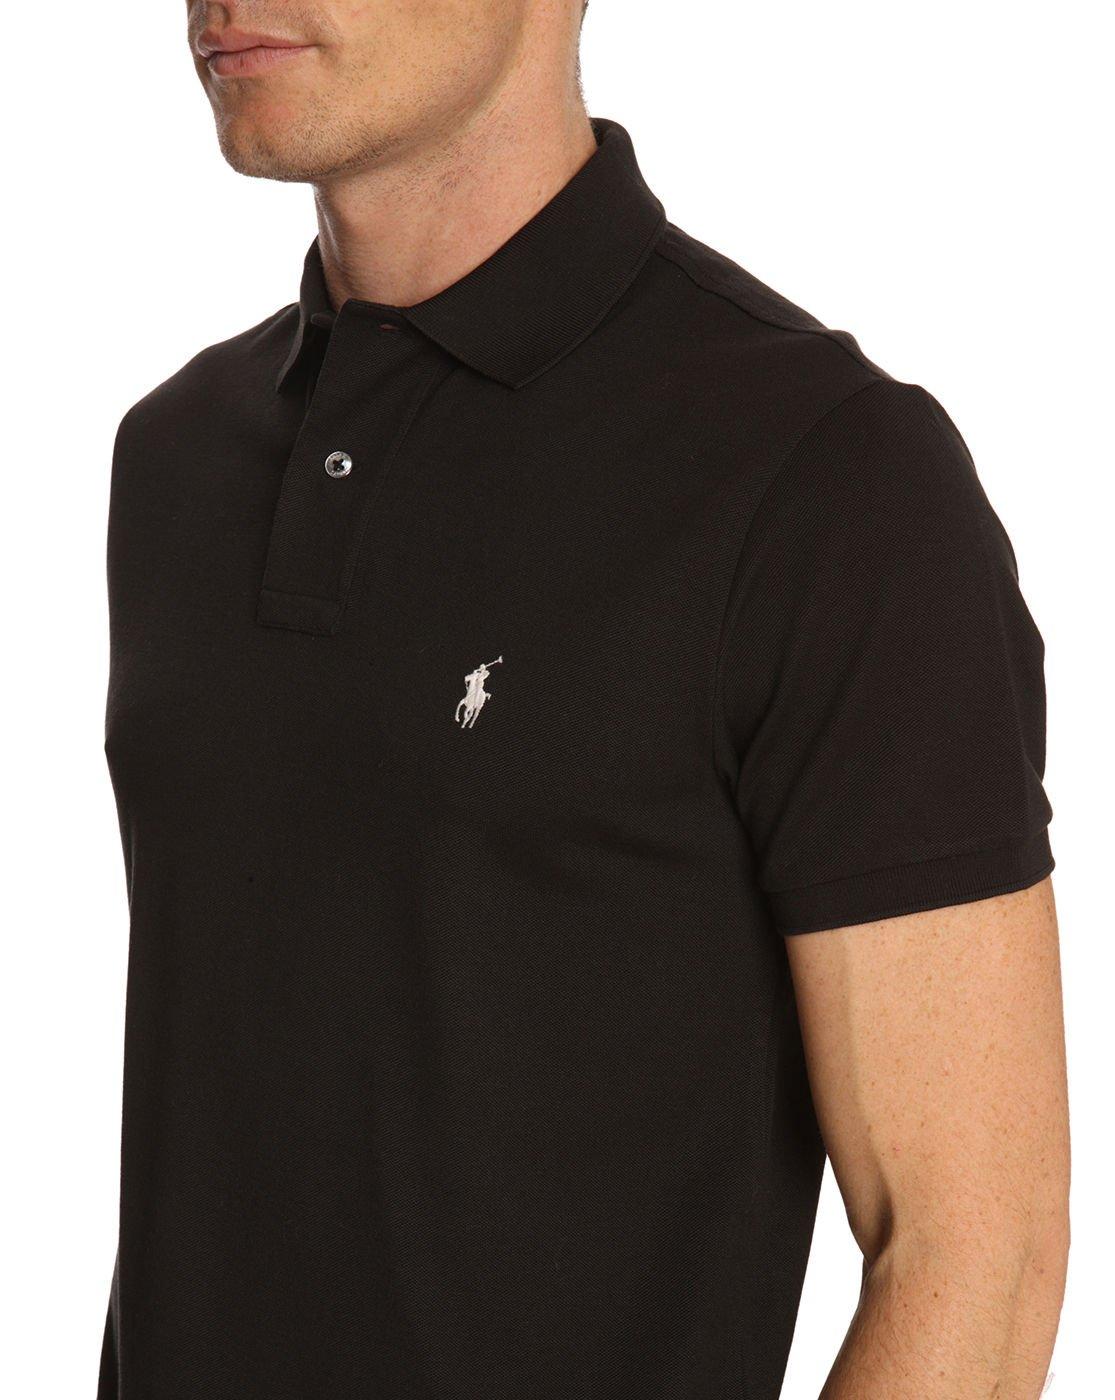 polo ralph lauren black slim fit stretch polo shirt in black for men lyst. Black Bedroom Furniture Sets. Home Design Ideas